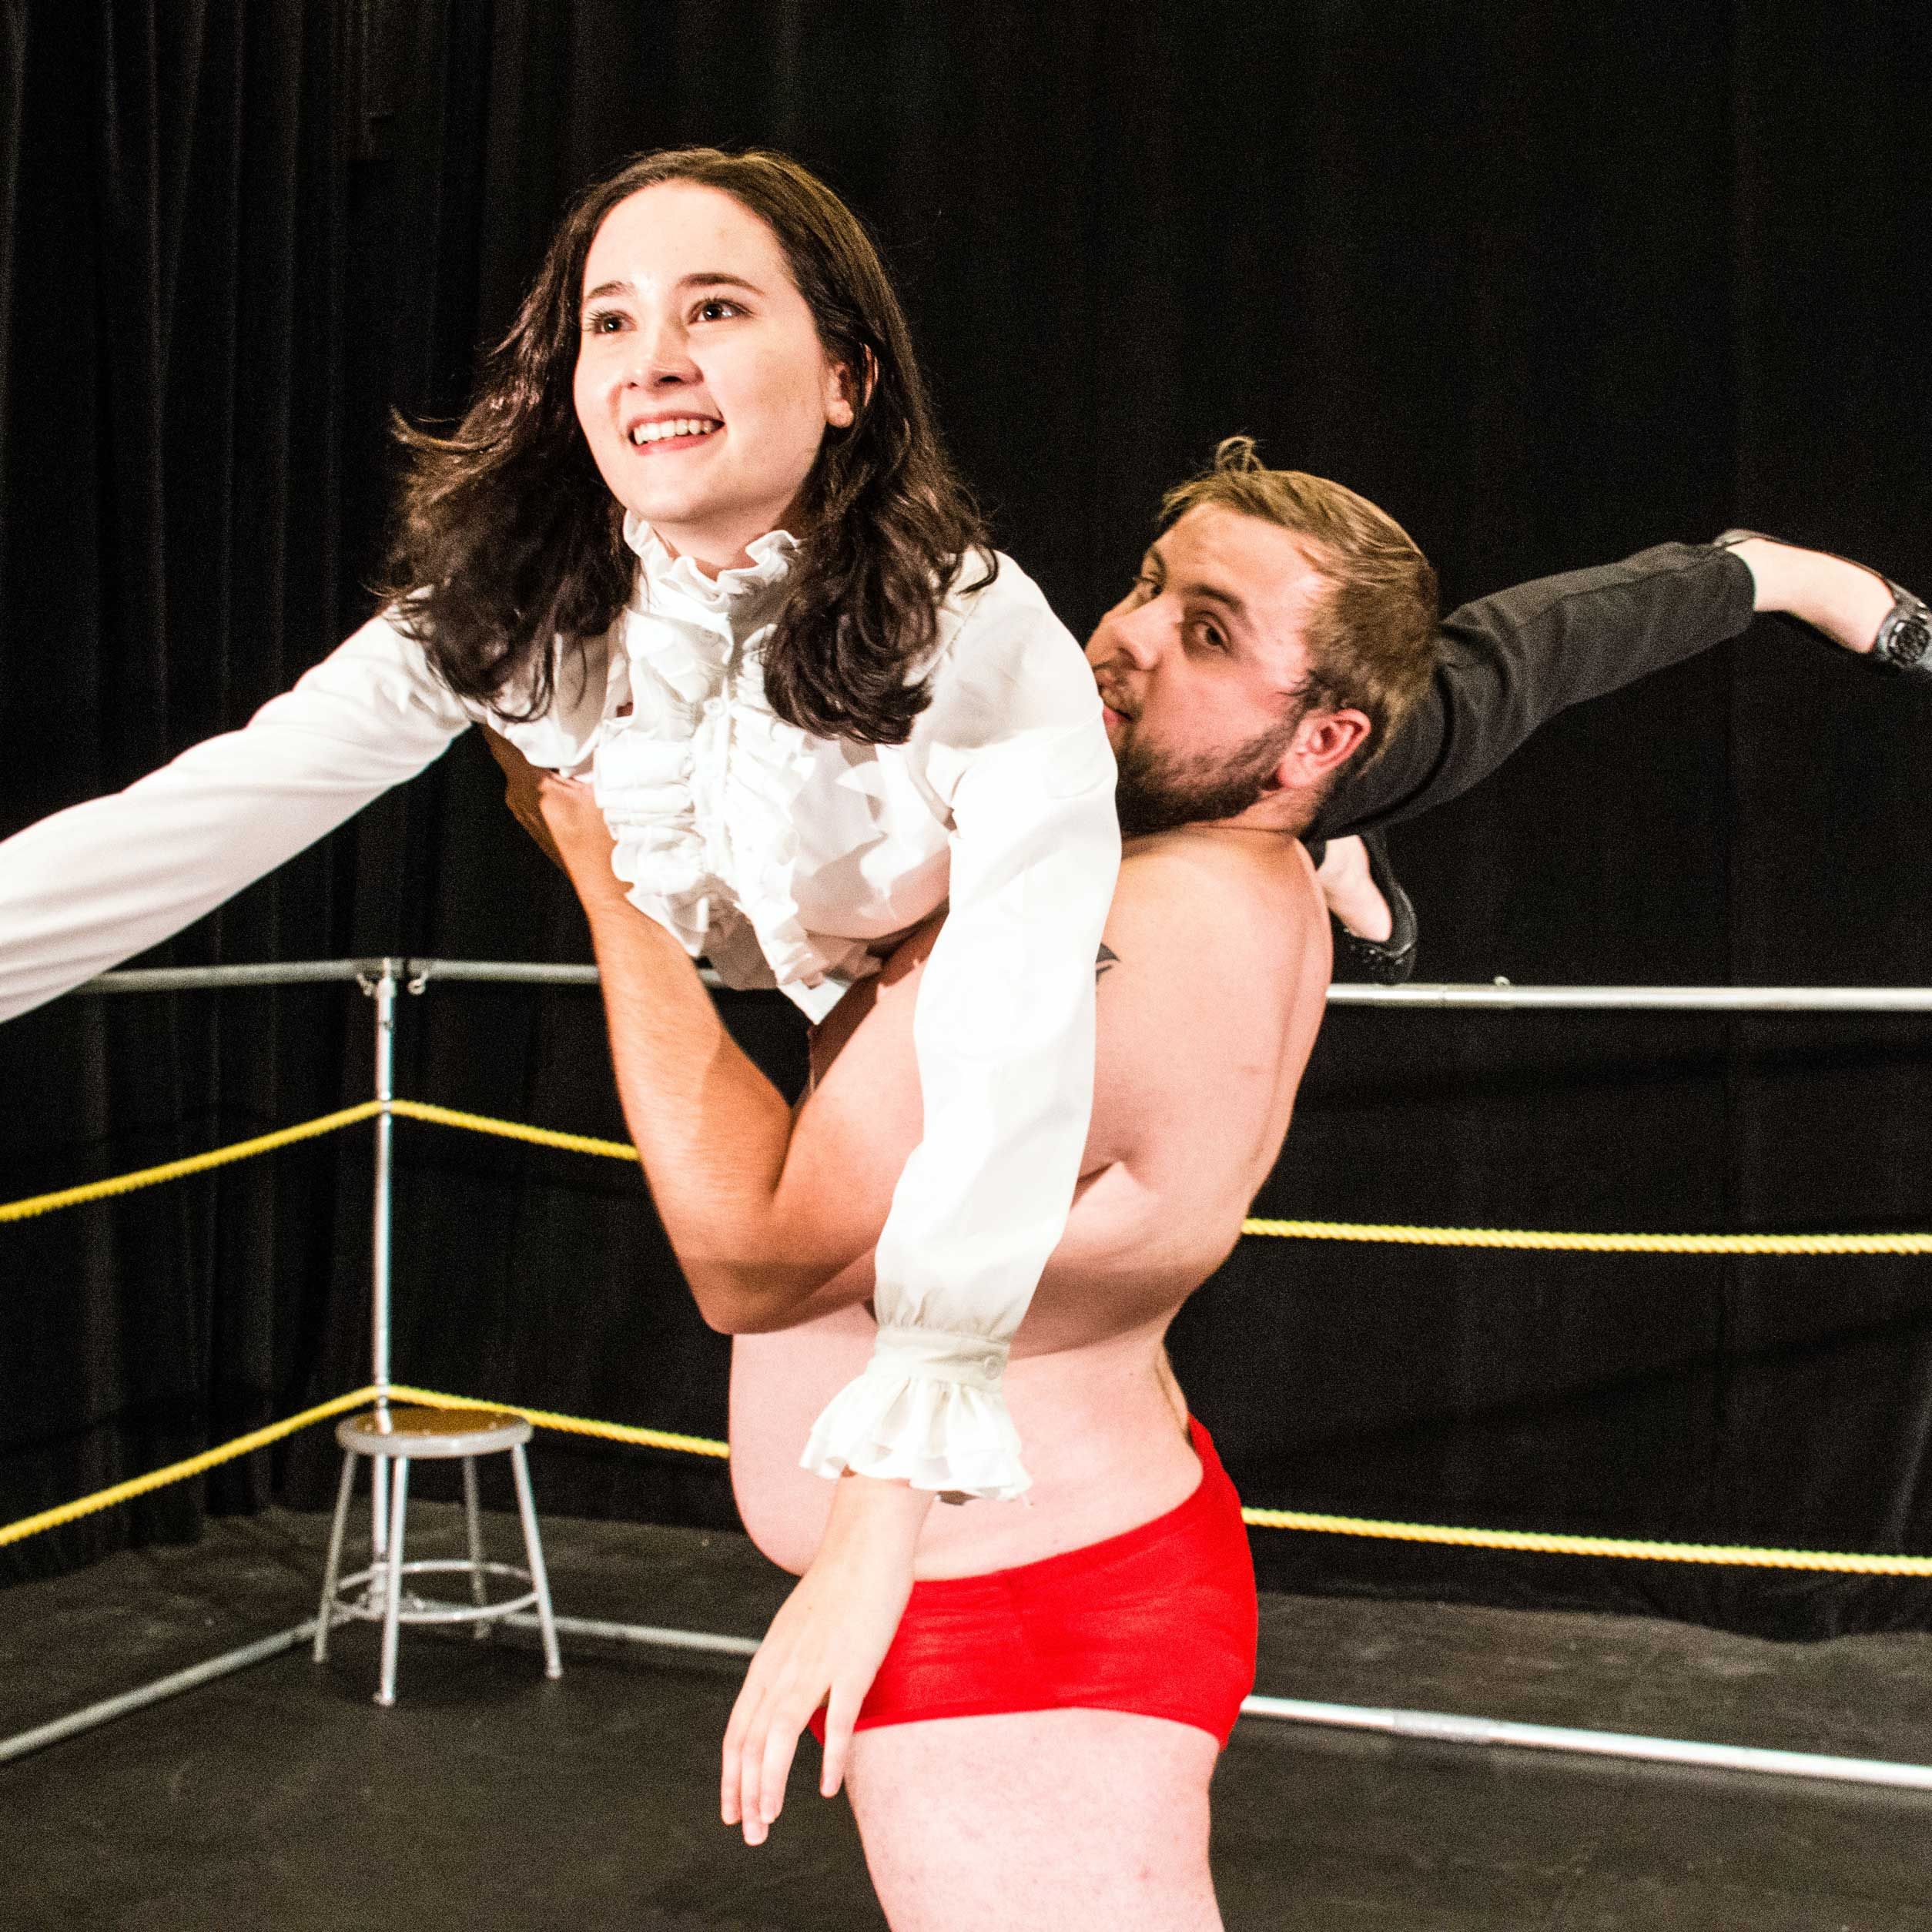 KPU students Stephanie Davies as Tranio and Joseph Beland at the Ring Guy.jpg